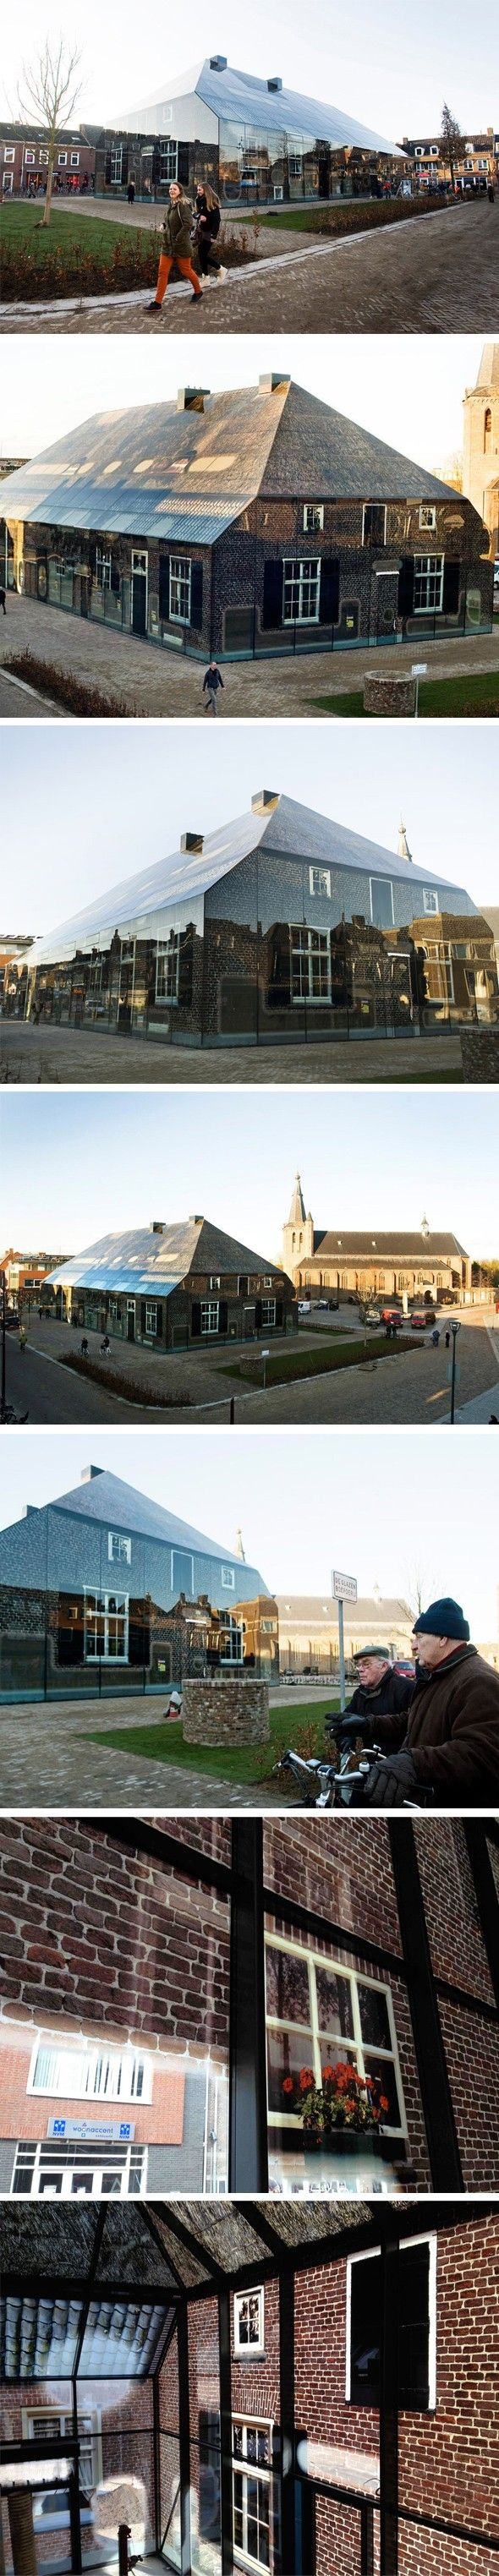 Glass farm mvrdv illusion archétype démesure lumière